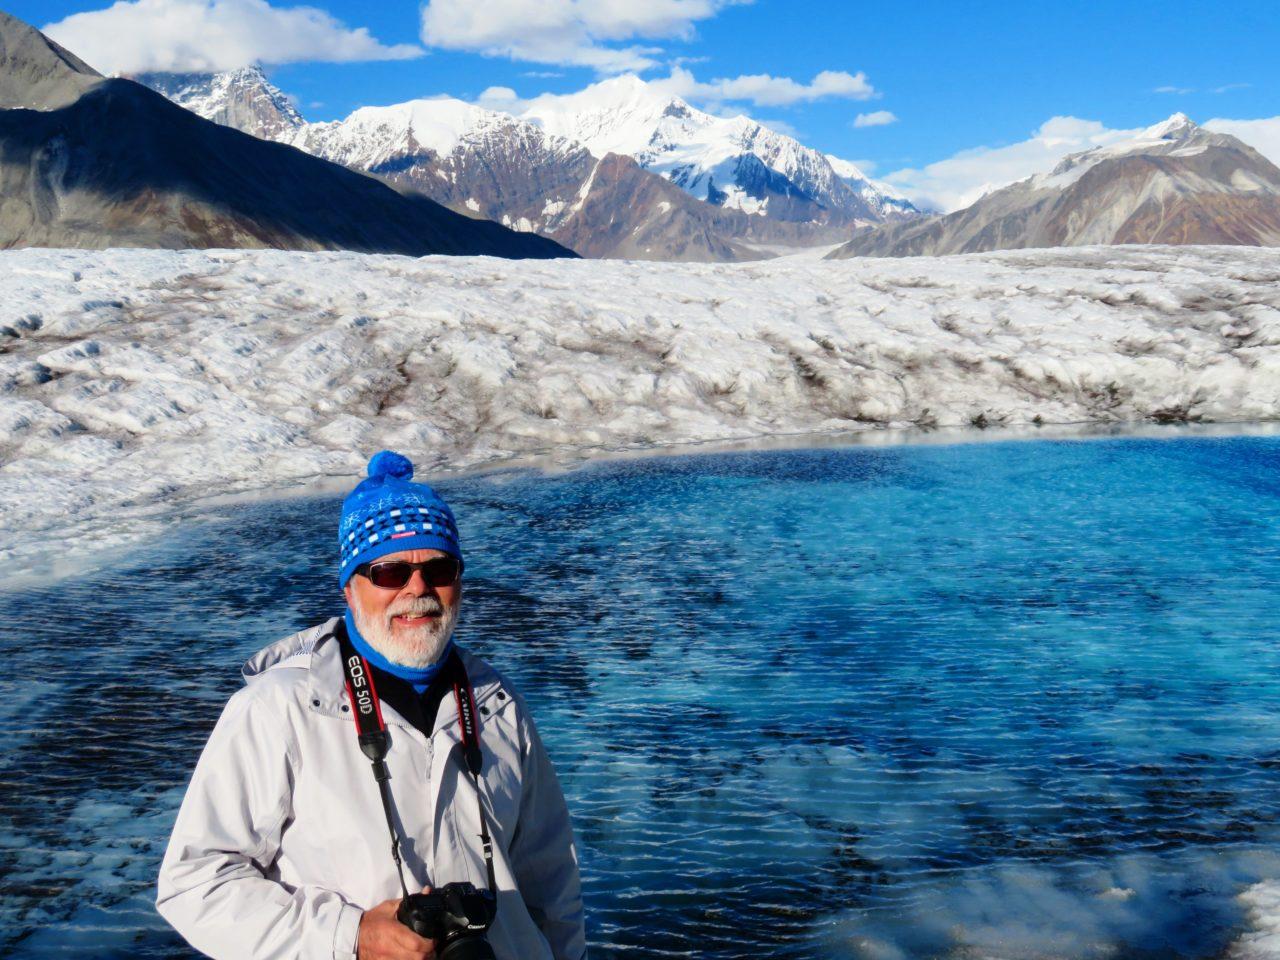 Glacier walk during our Alaska Cruise with Princess Cruises